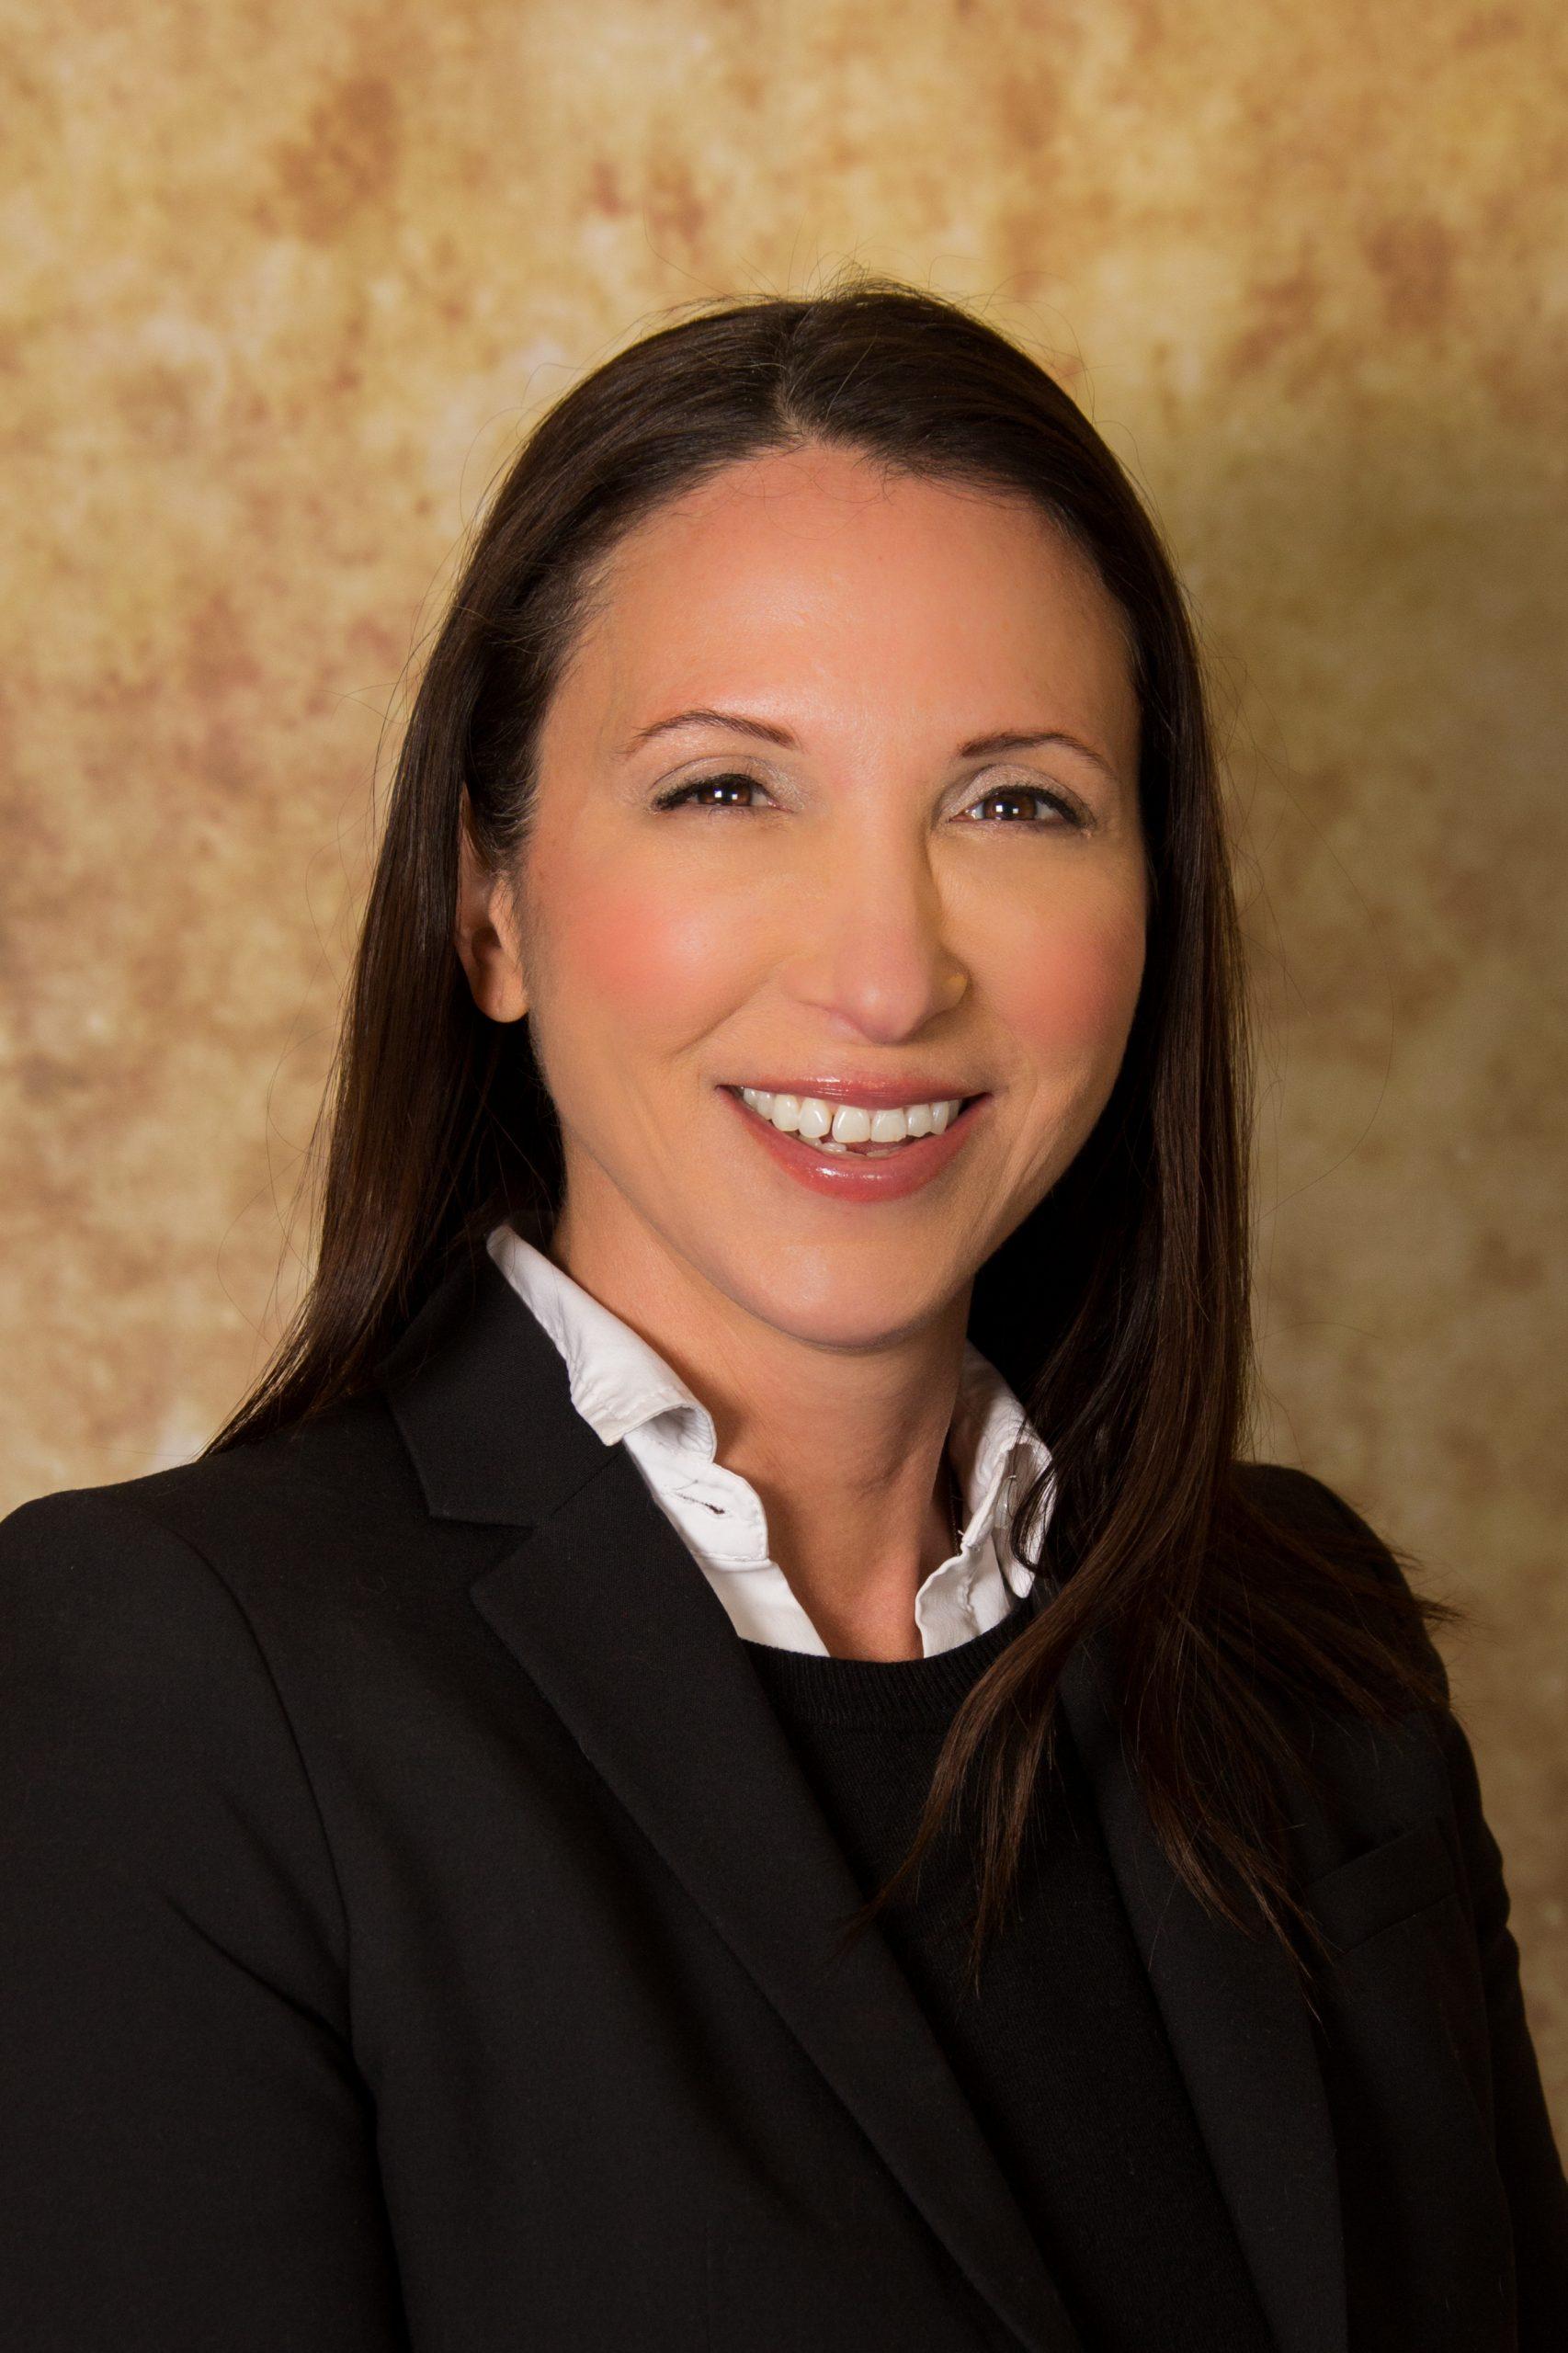 Big Bear Lake Council Appoints Perri Melnick